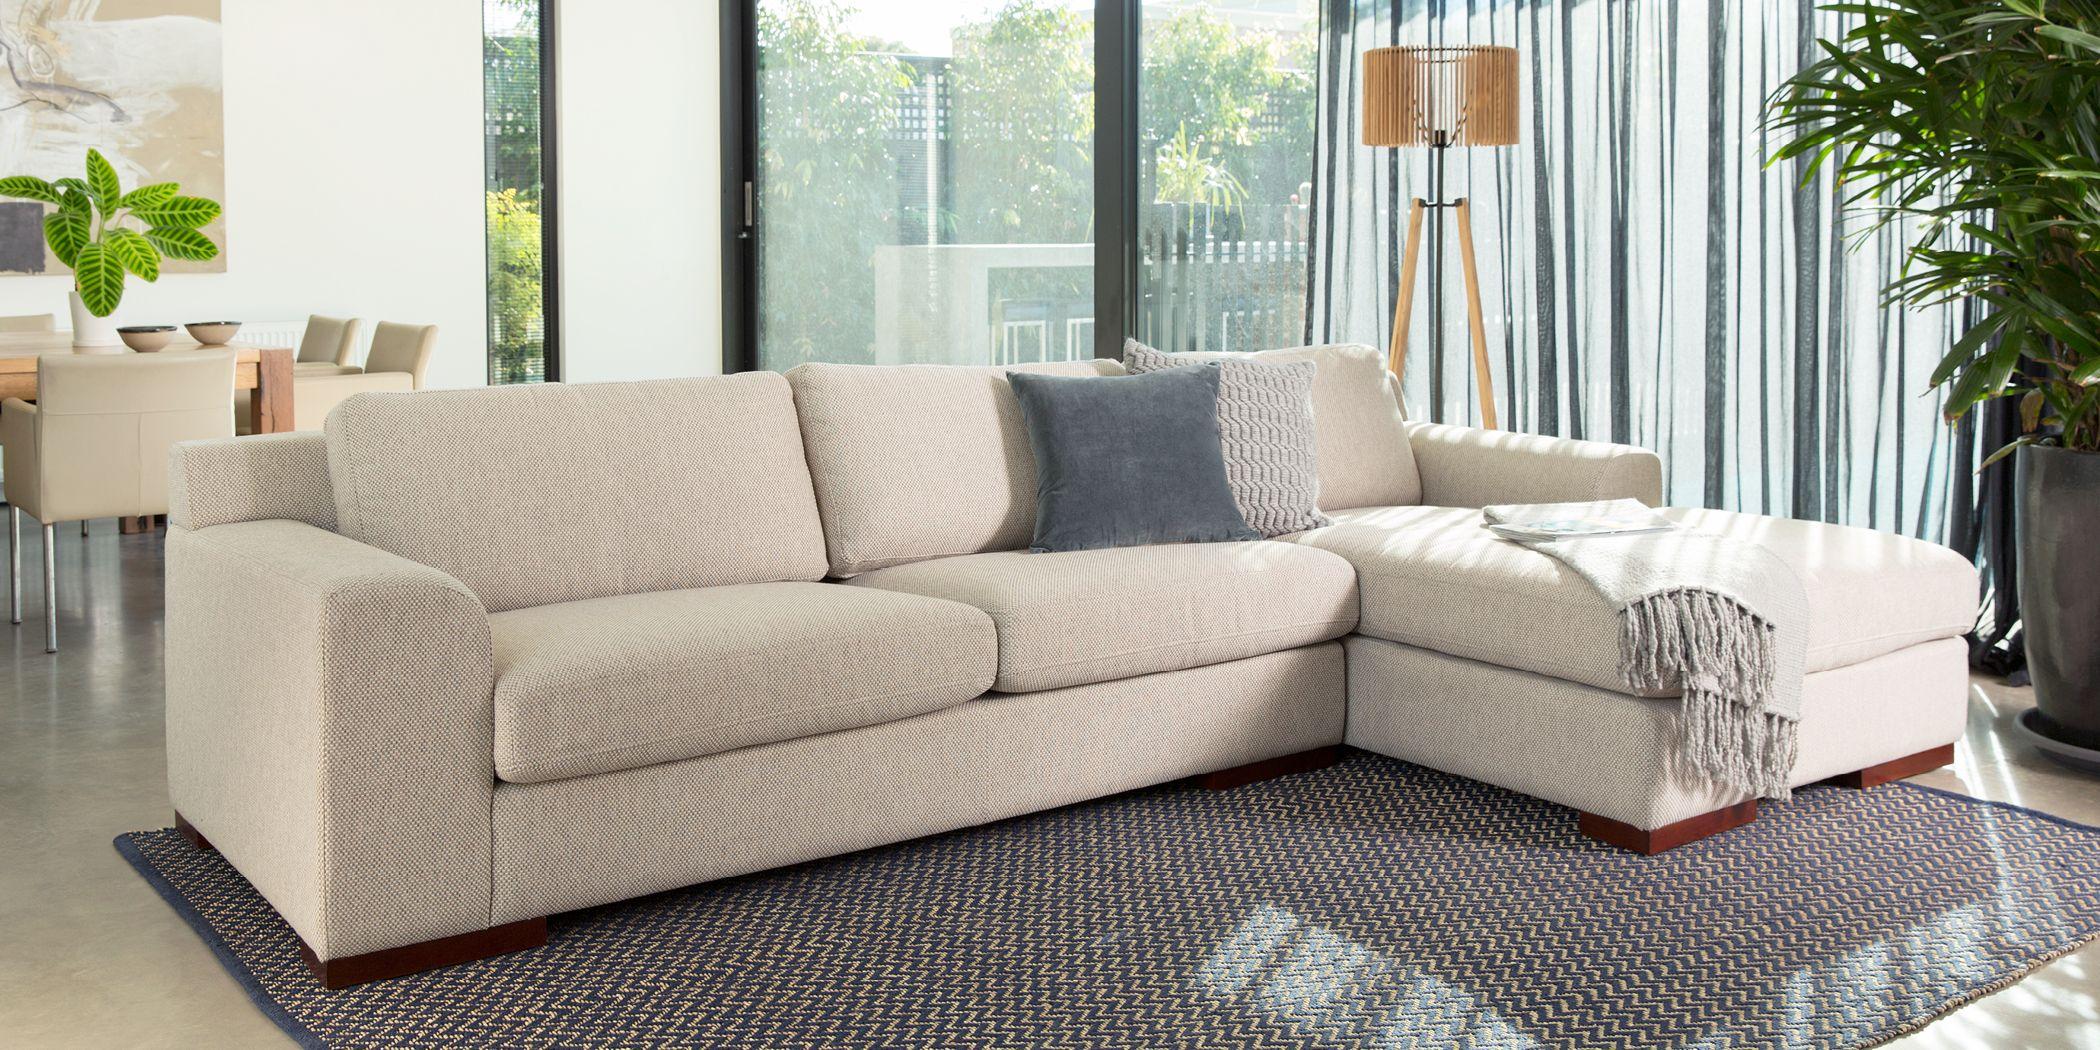 Cool Plush Sofa , Super Plush Sofa 45 Living Room Sofa Inspiration With Plush  Sofa ,